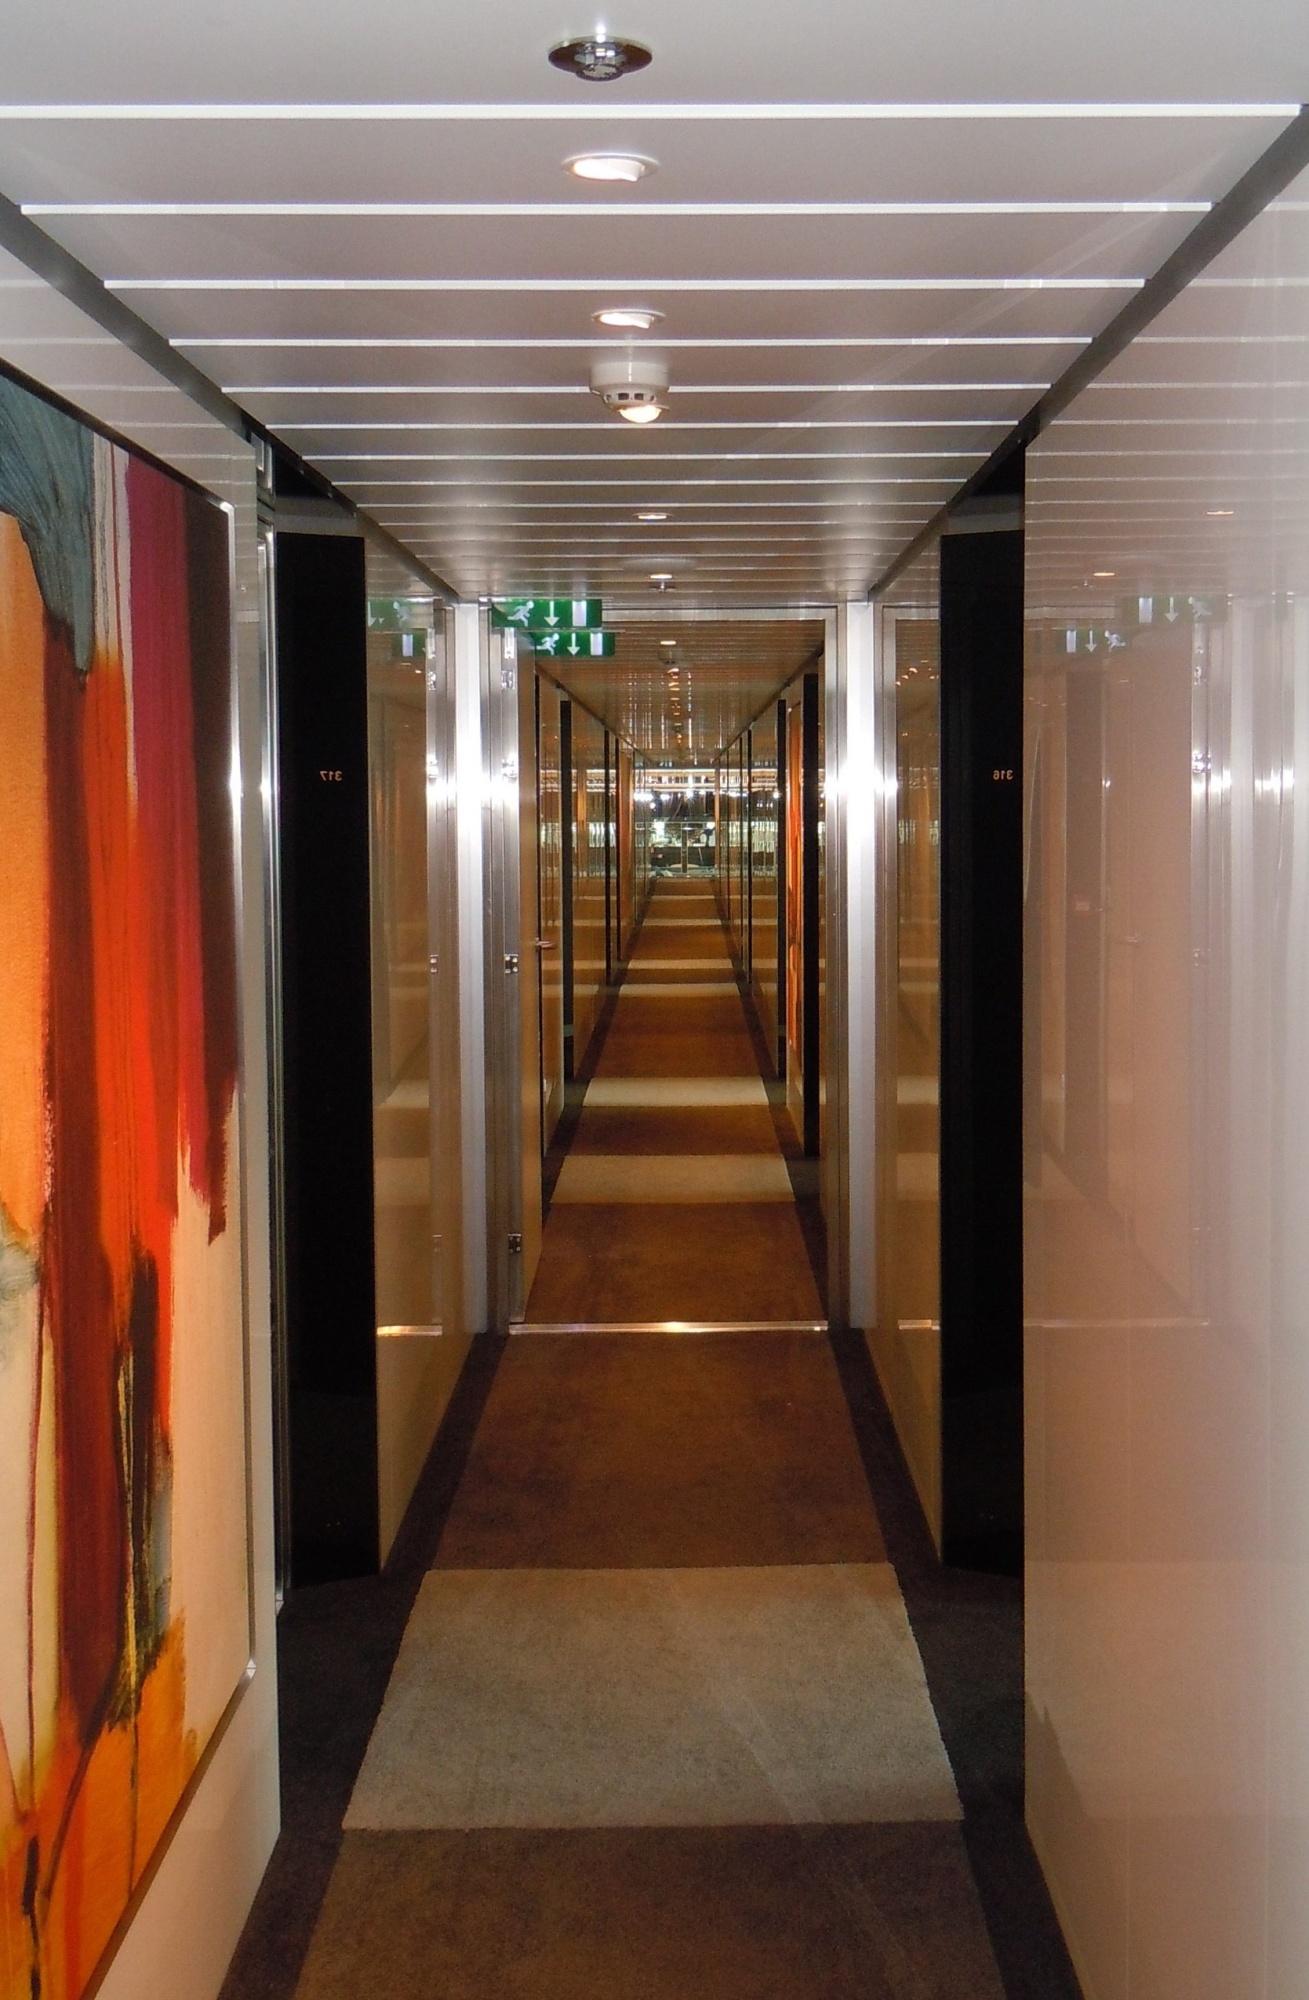 The Corridor v2